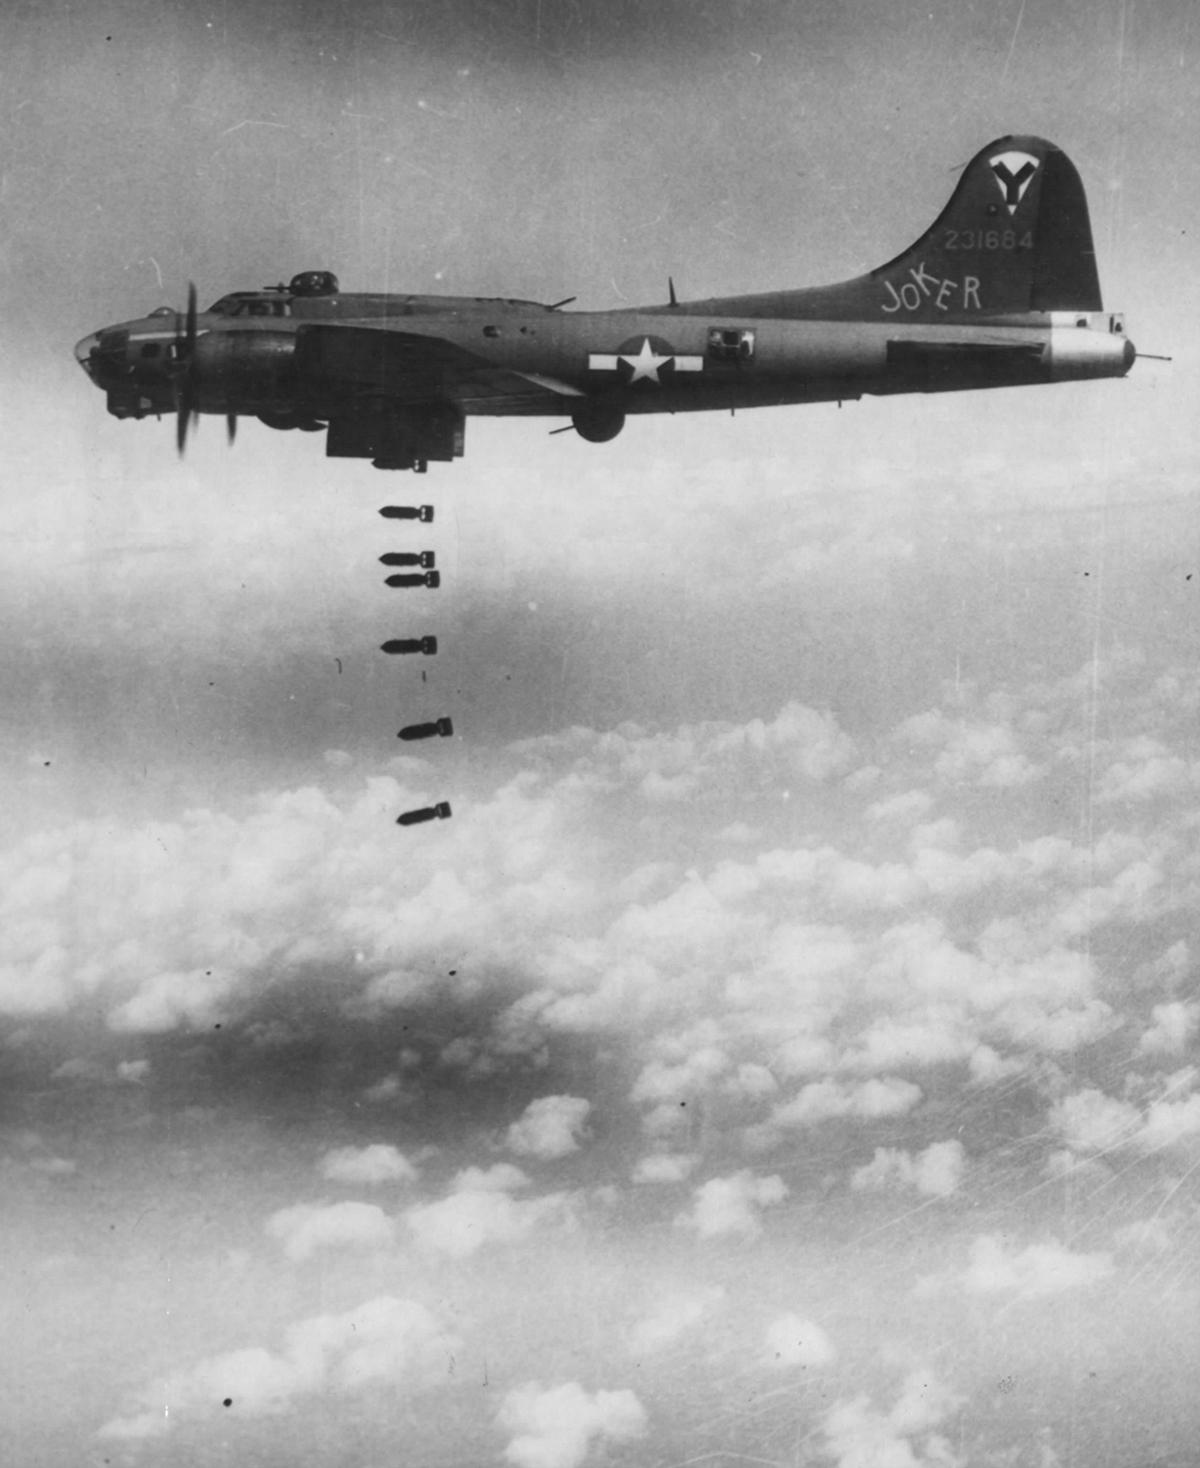 B-17 42-31684